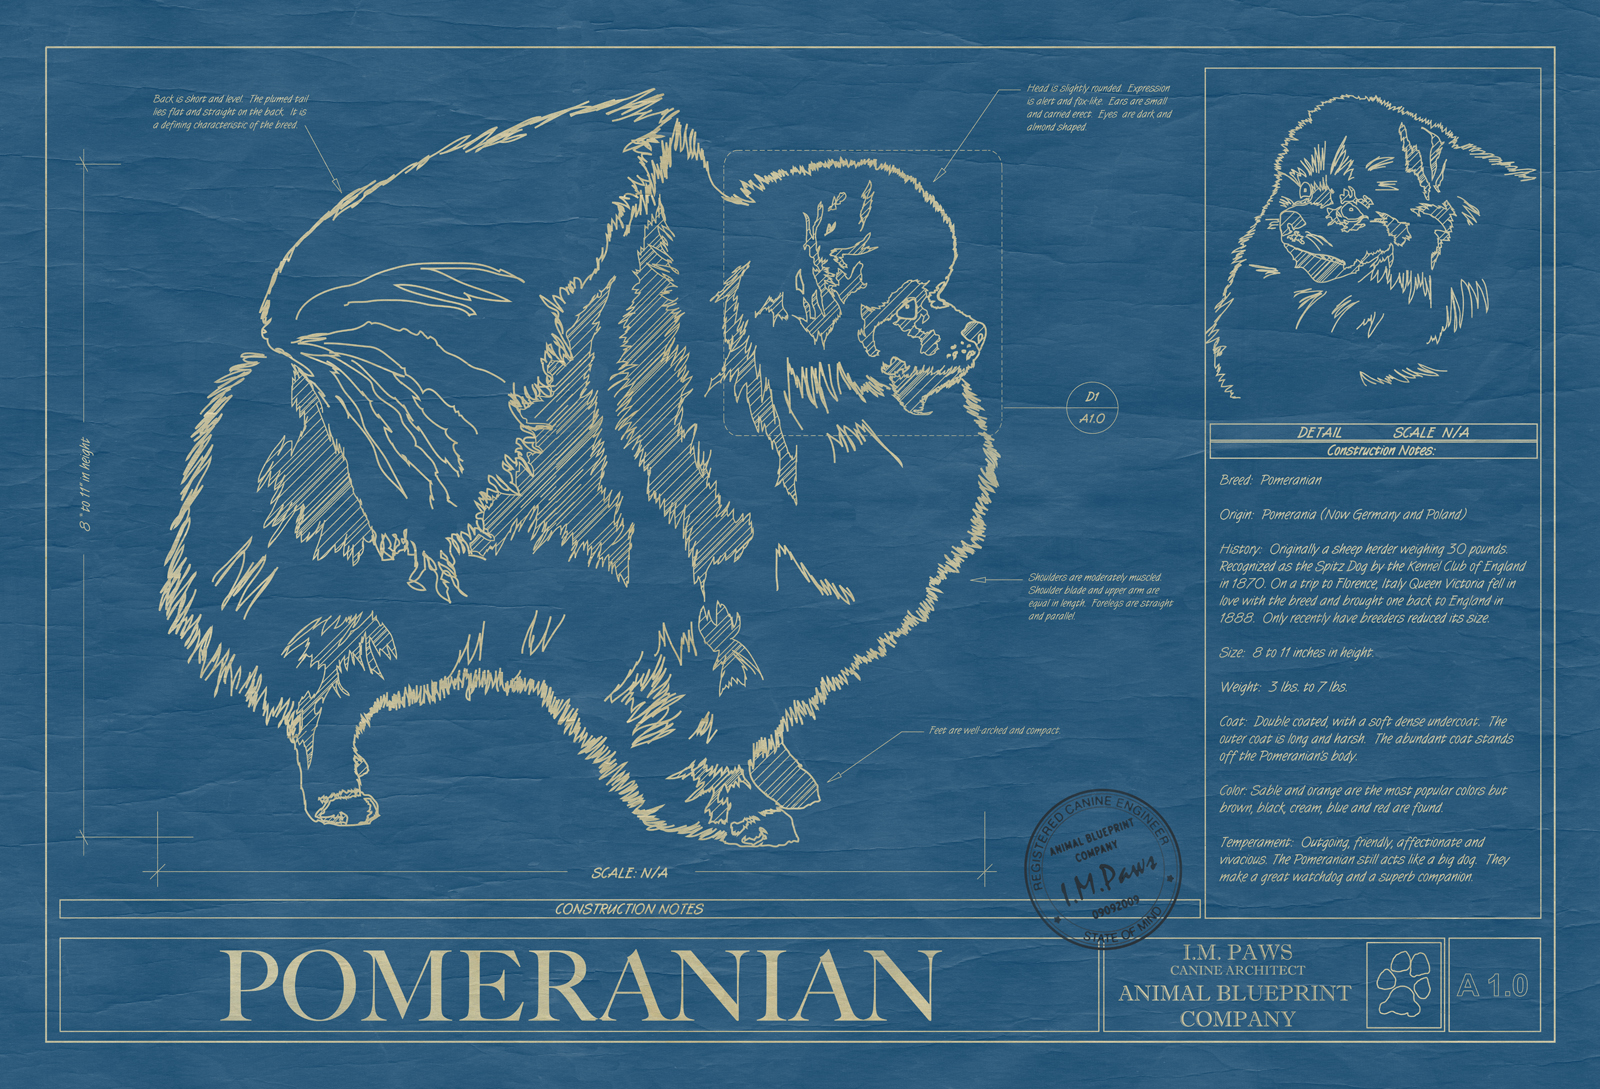 Pomeranian animal blueprint company pomeranian dog blueprint malvernweather Gallery